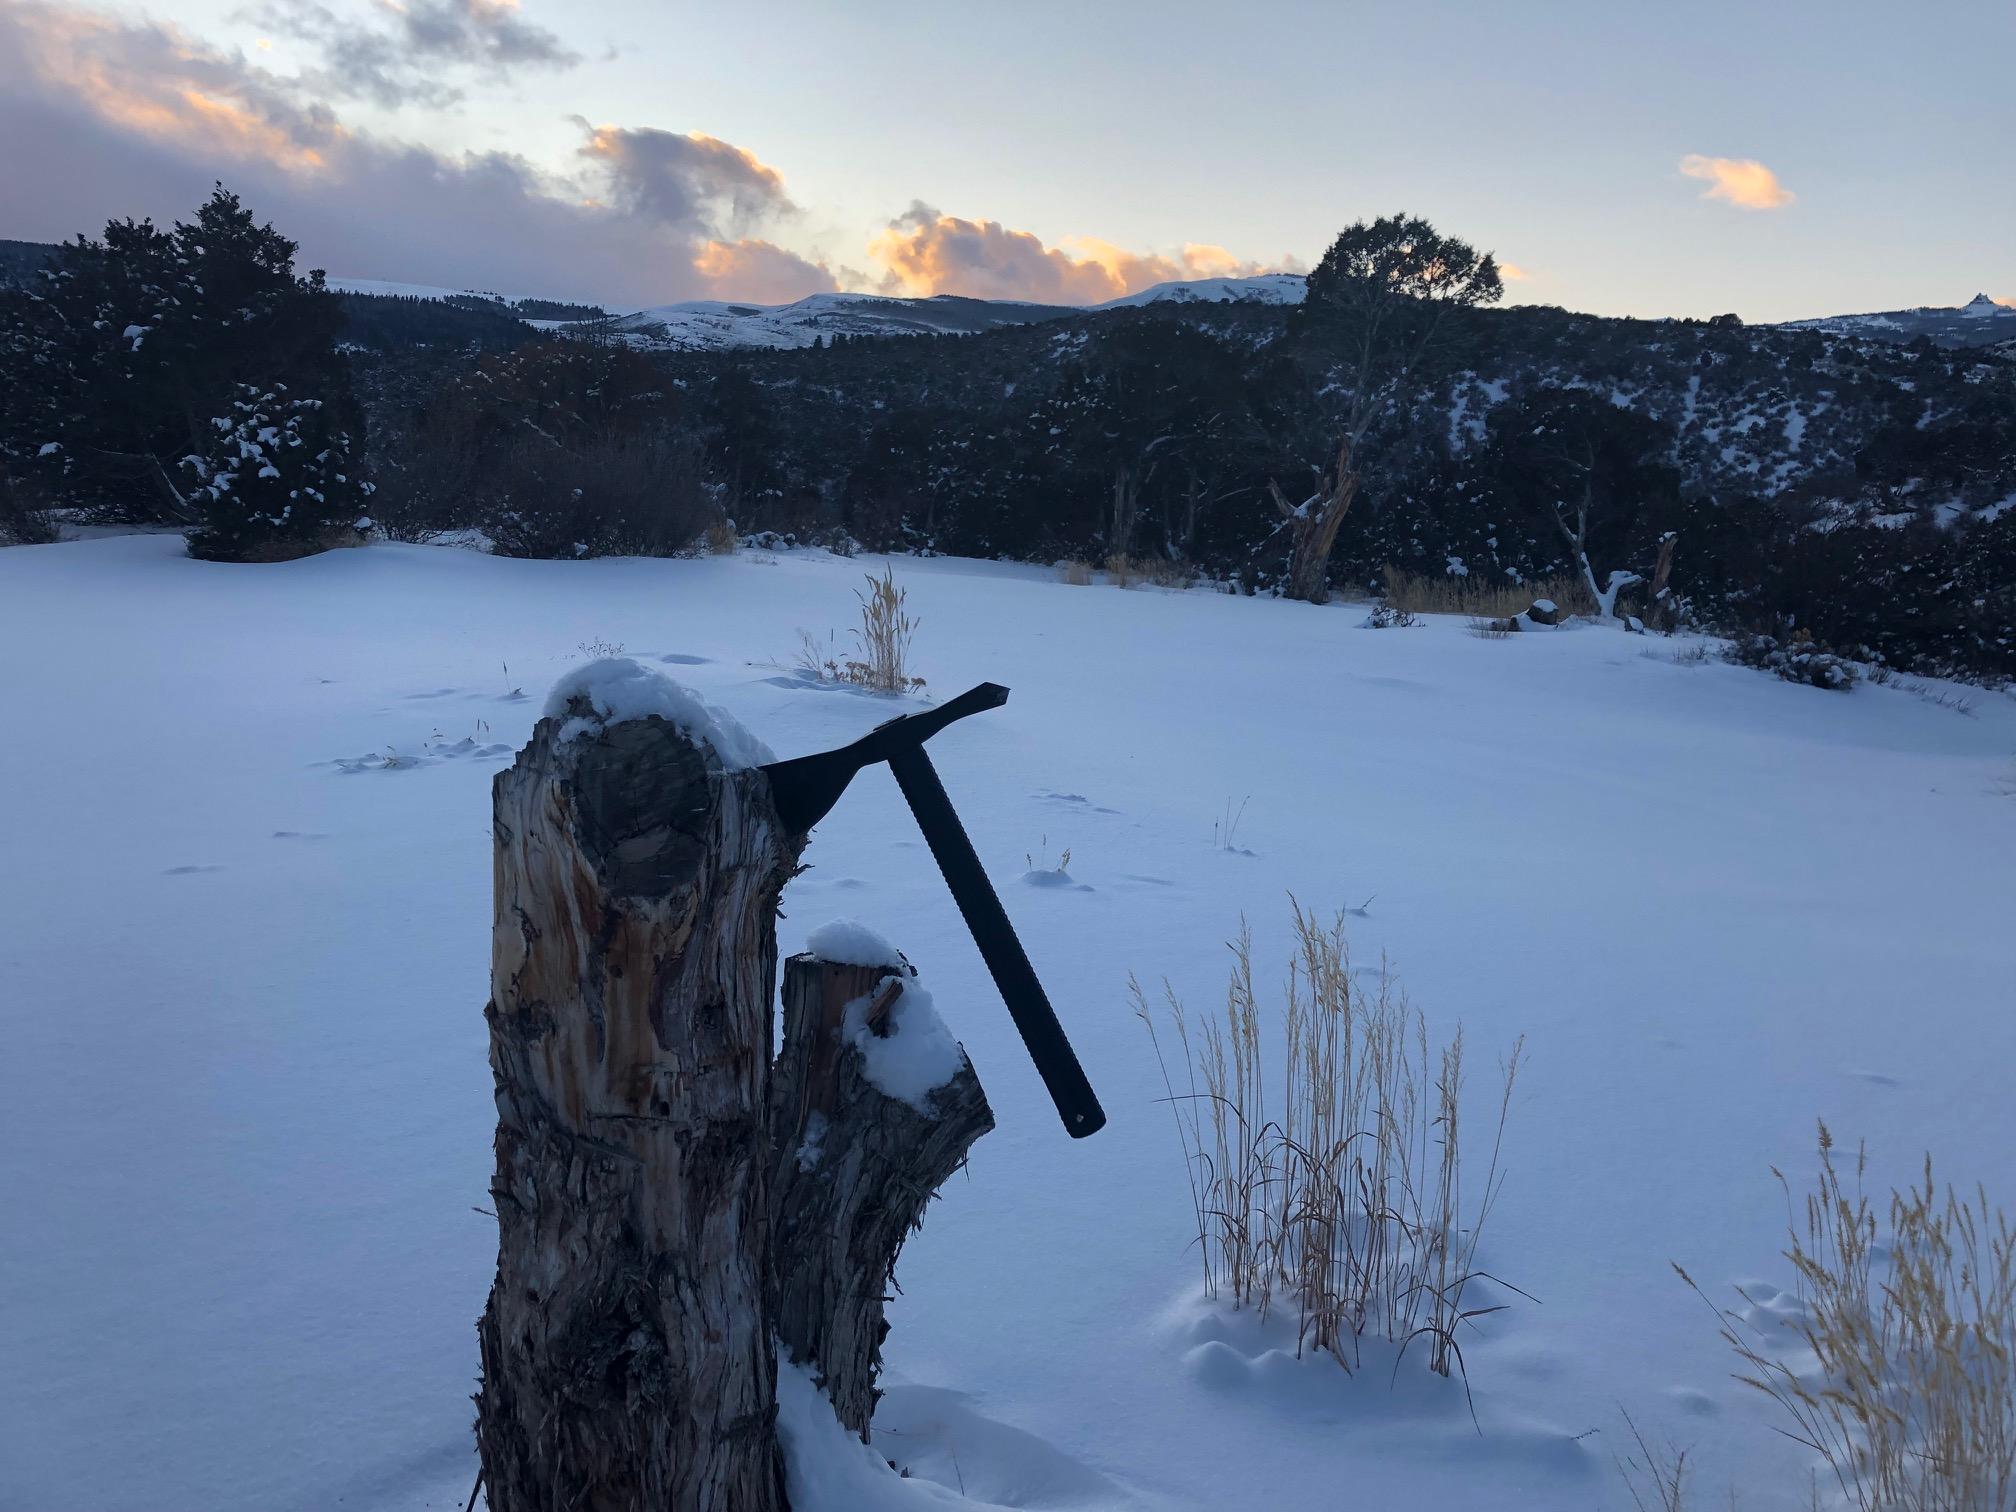 Tomahawk Model 1 Snow